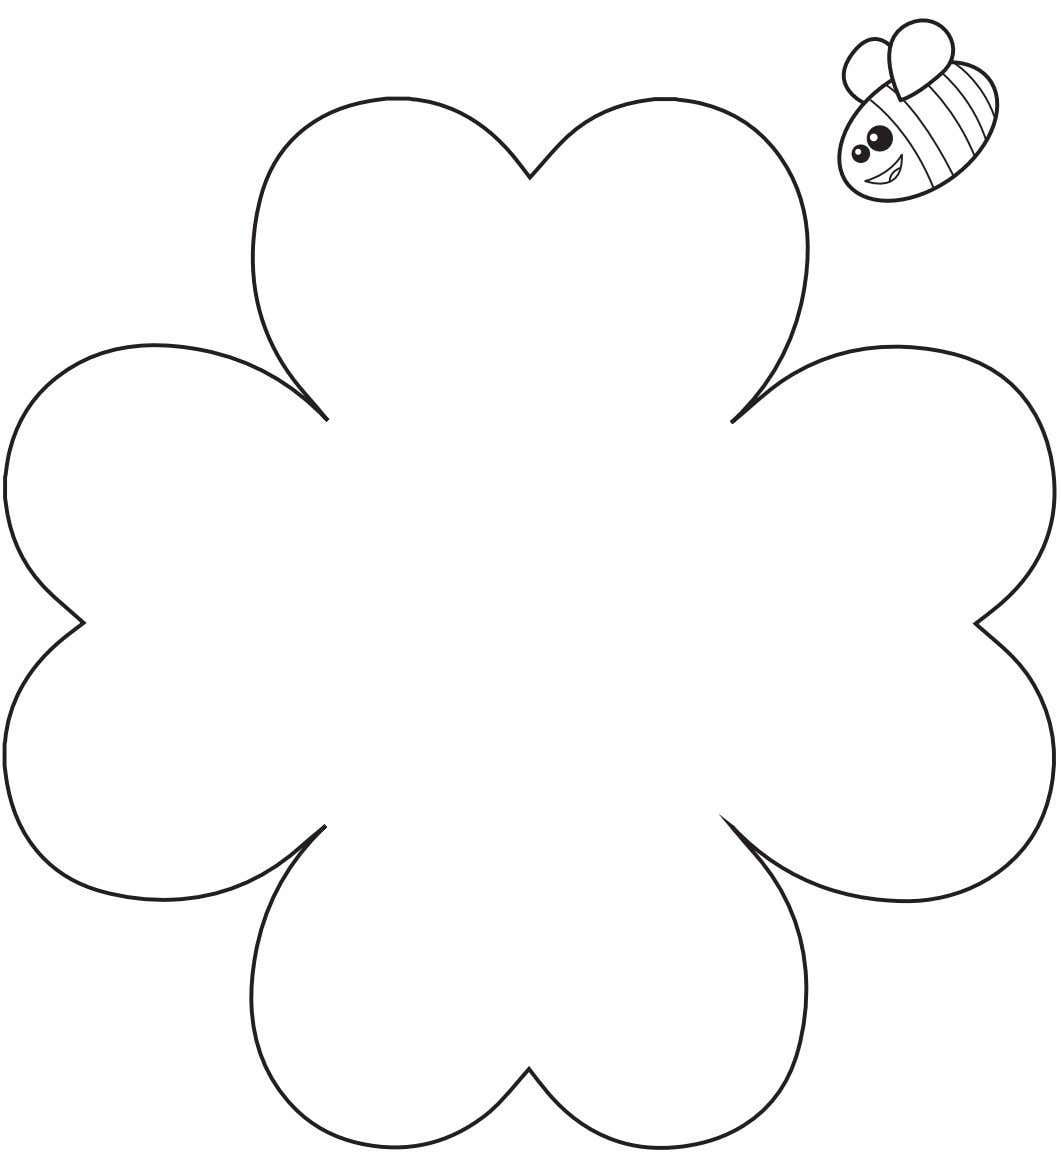 Heart Flower Craft Template Pdf Flower Crafts Kids Flower Crafts Diy Mother S Day Crafts